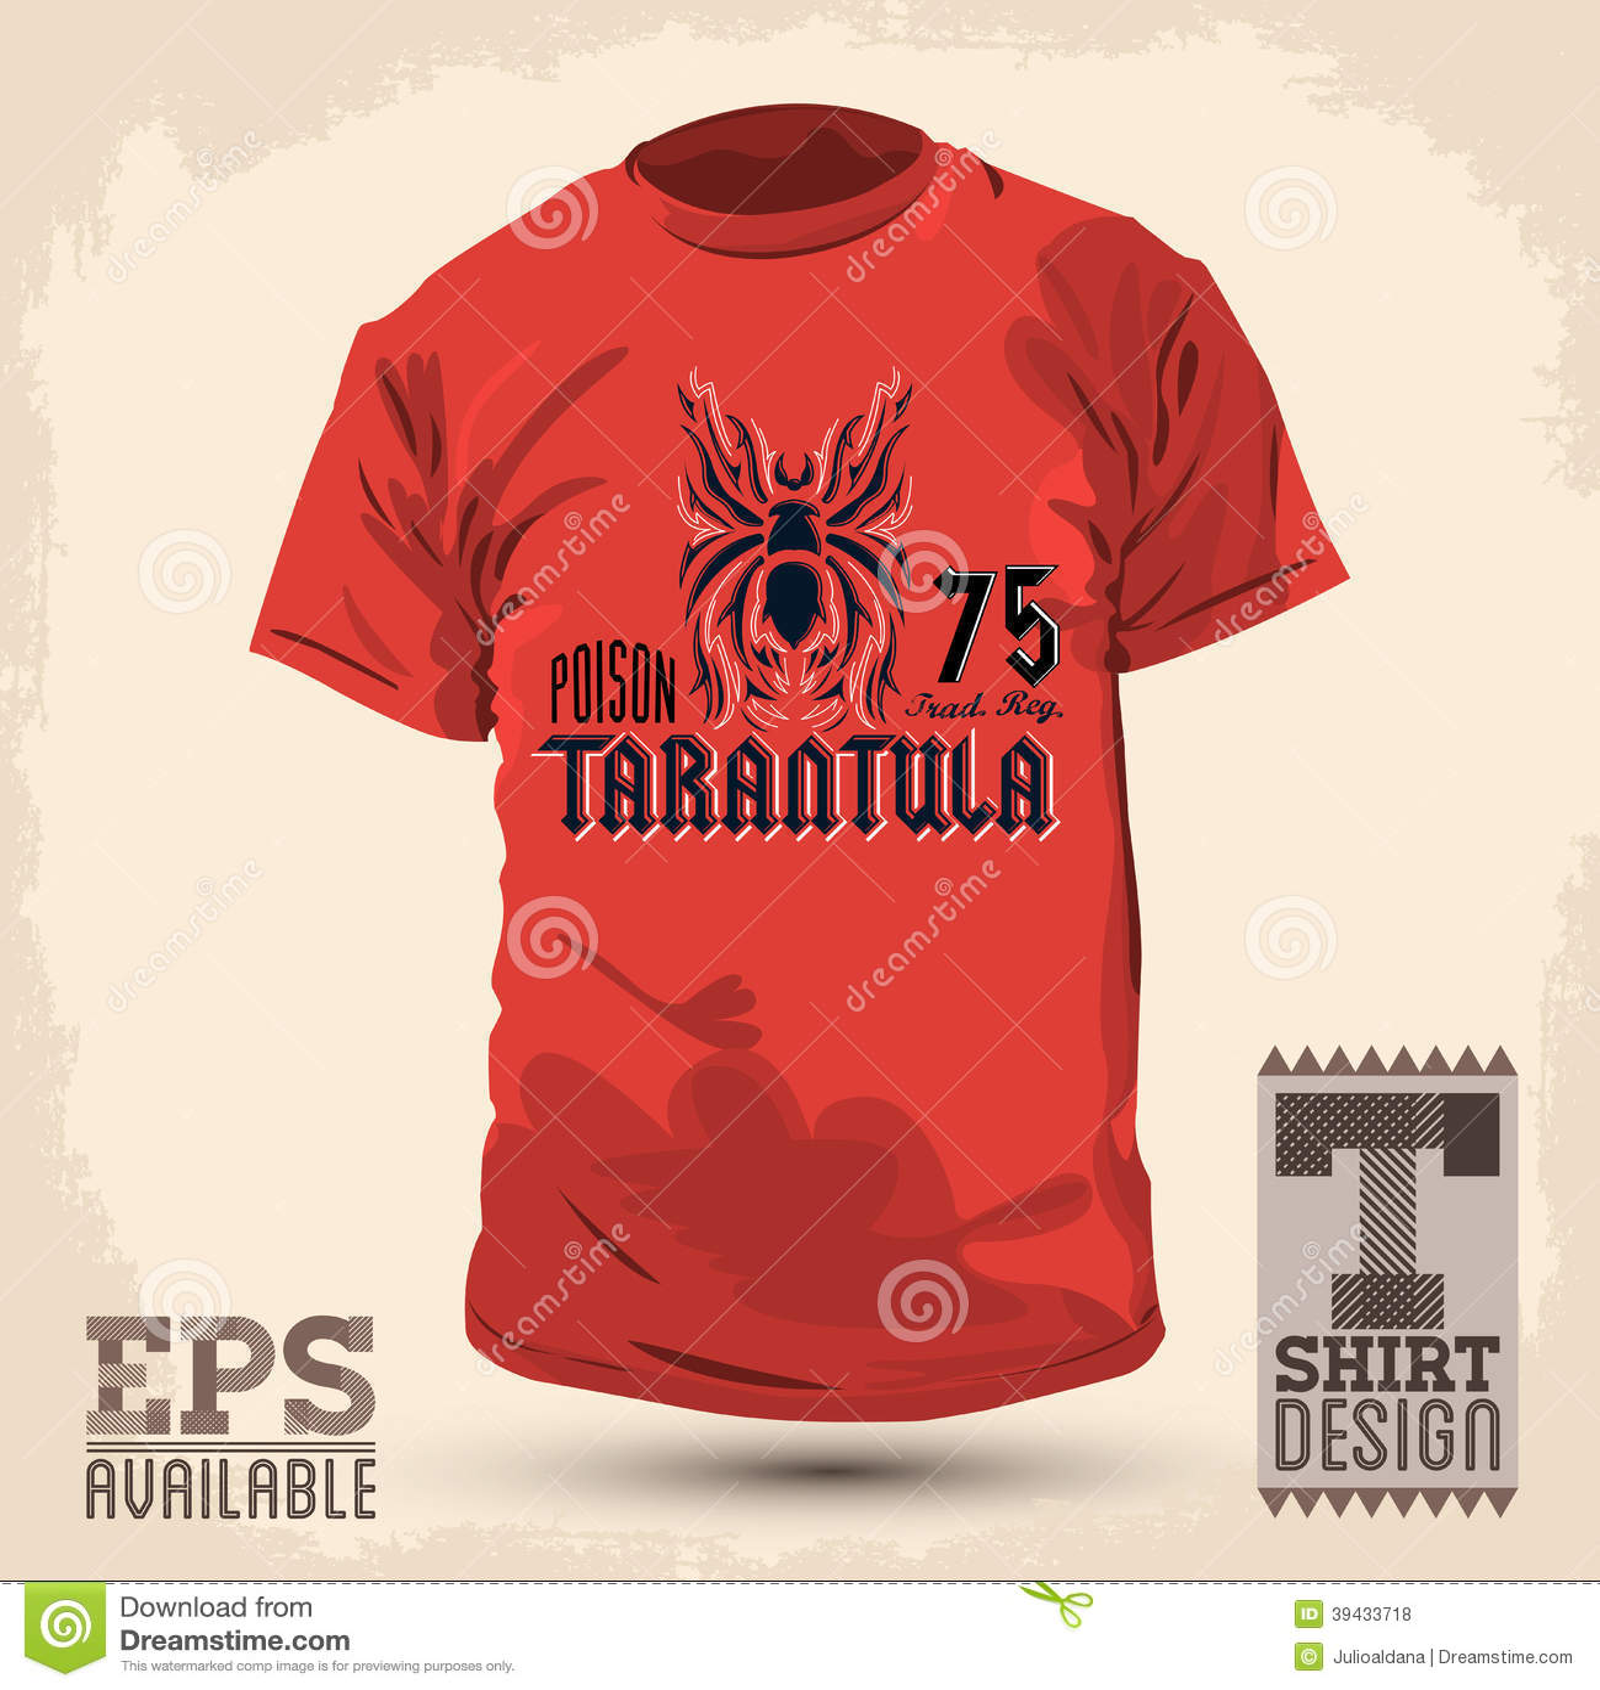 Graphic t shirt design tarantula lettering design stock for Stock t shirt designs